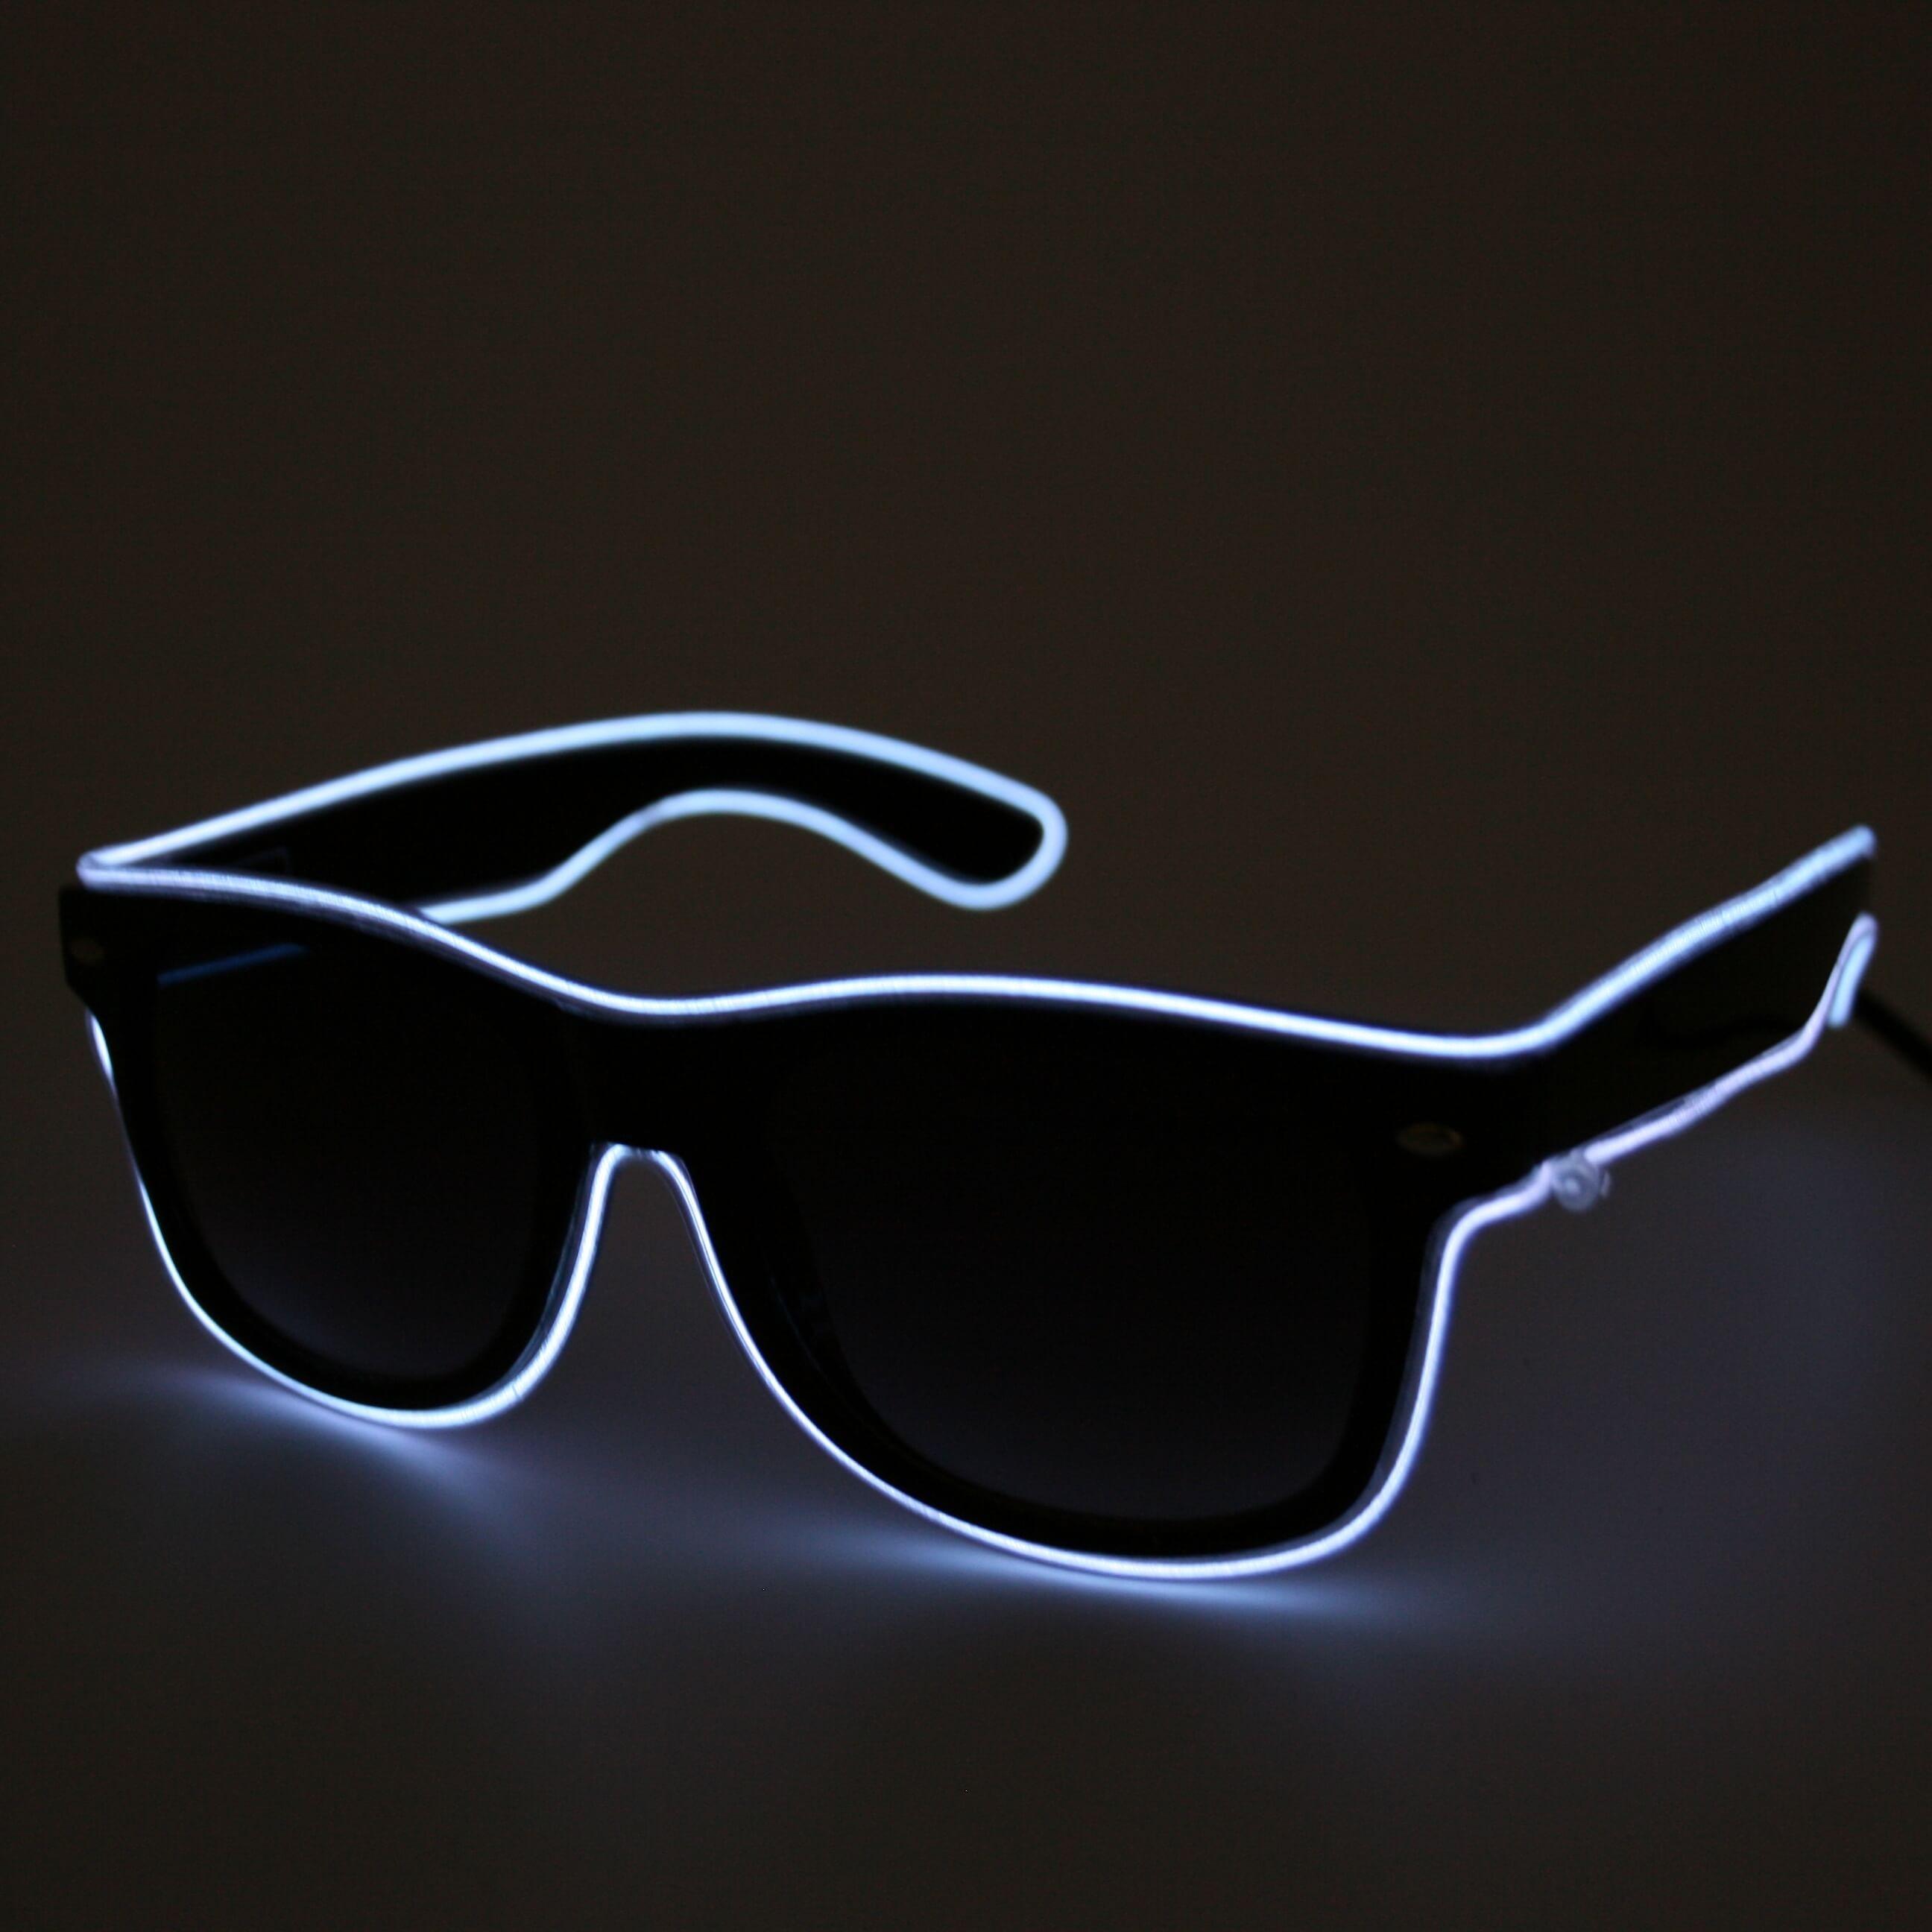 LED Glasses neon white